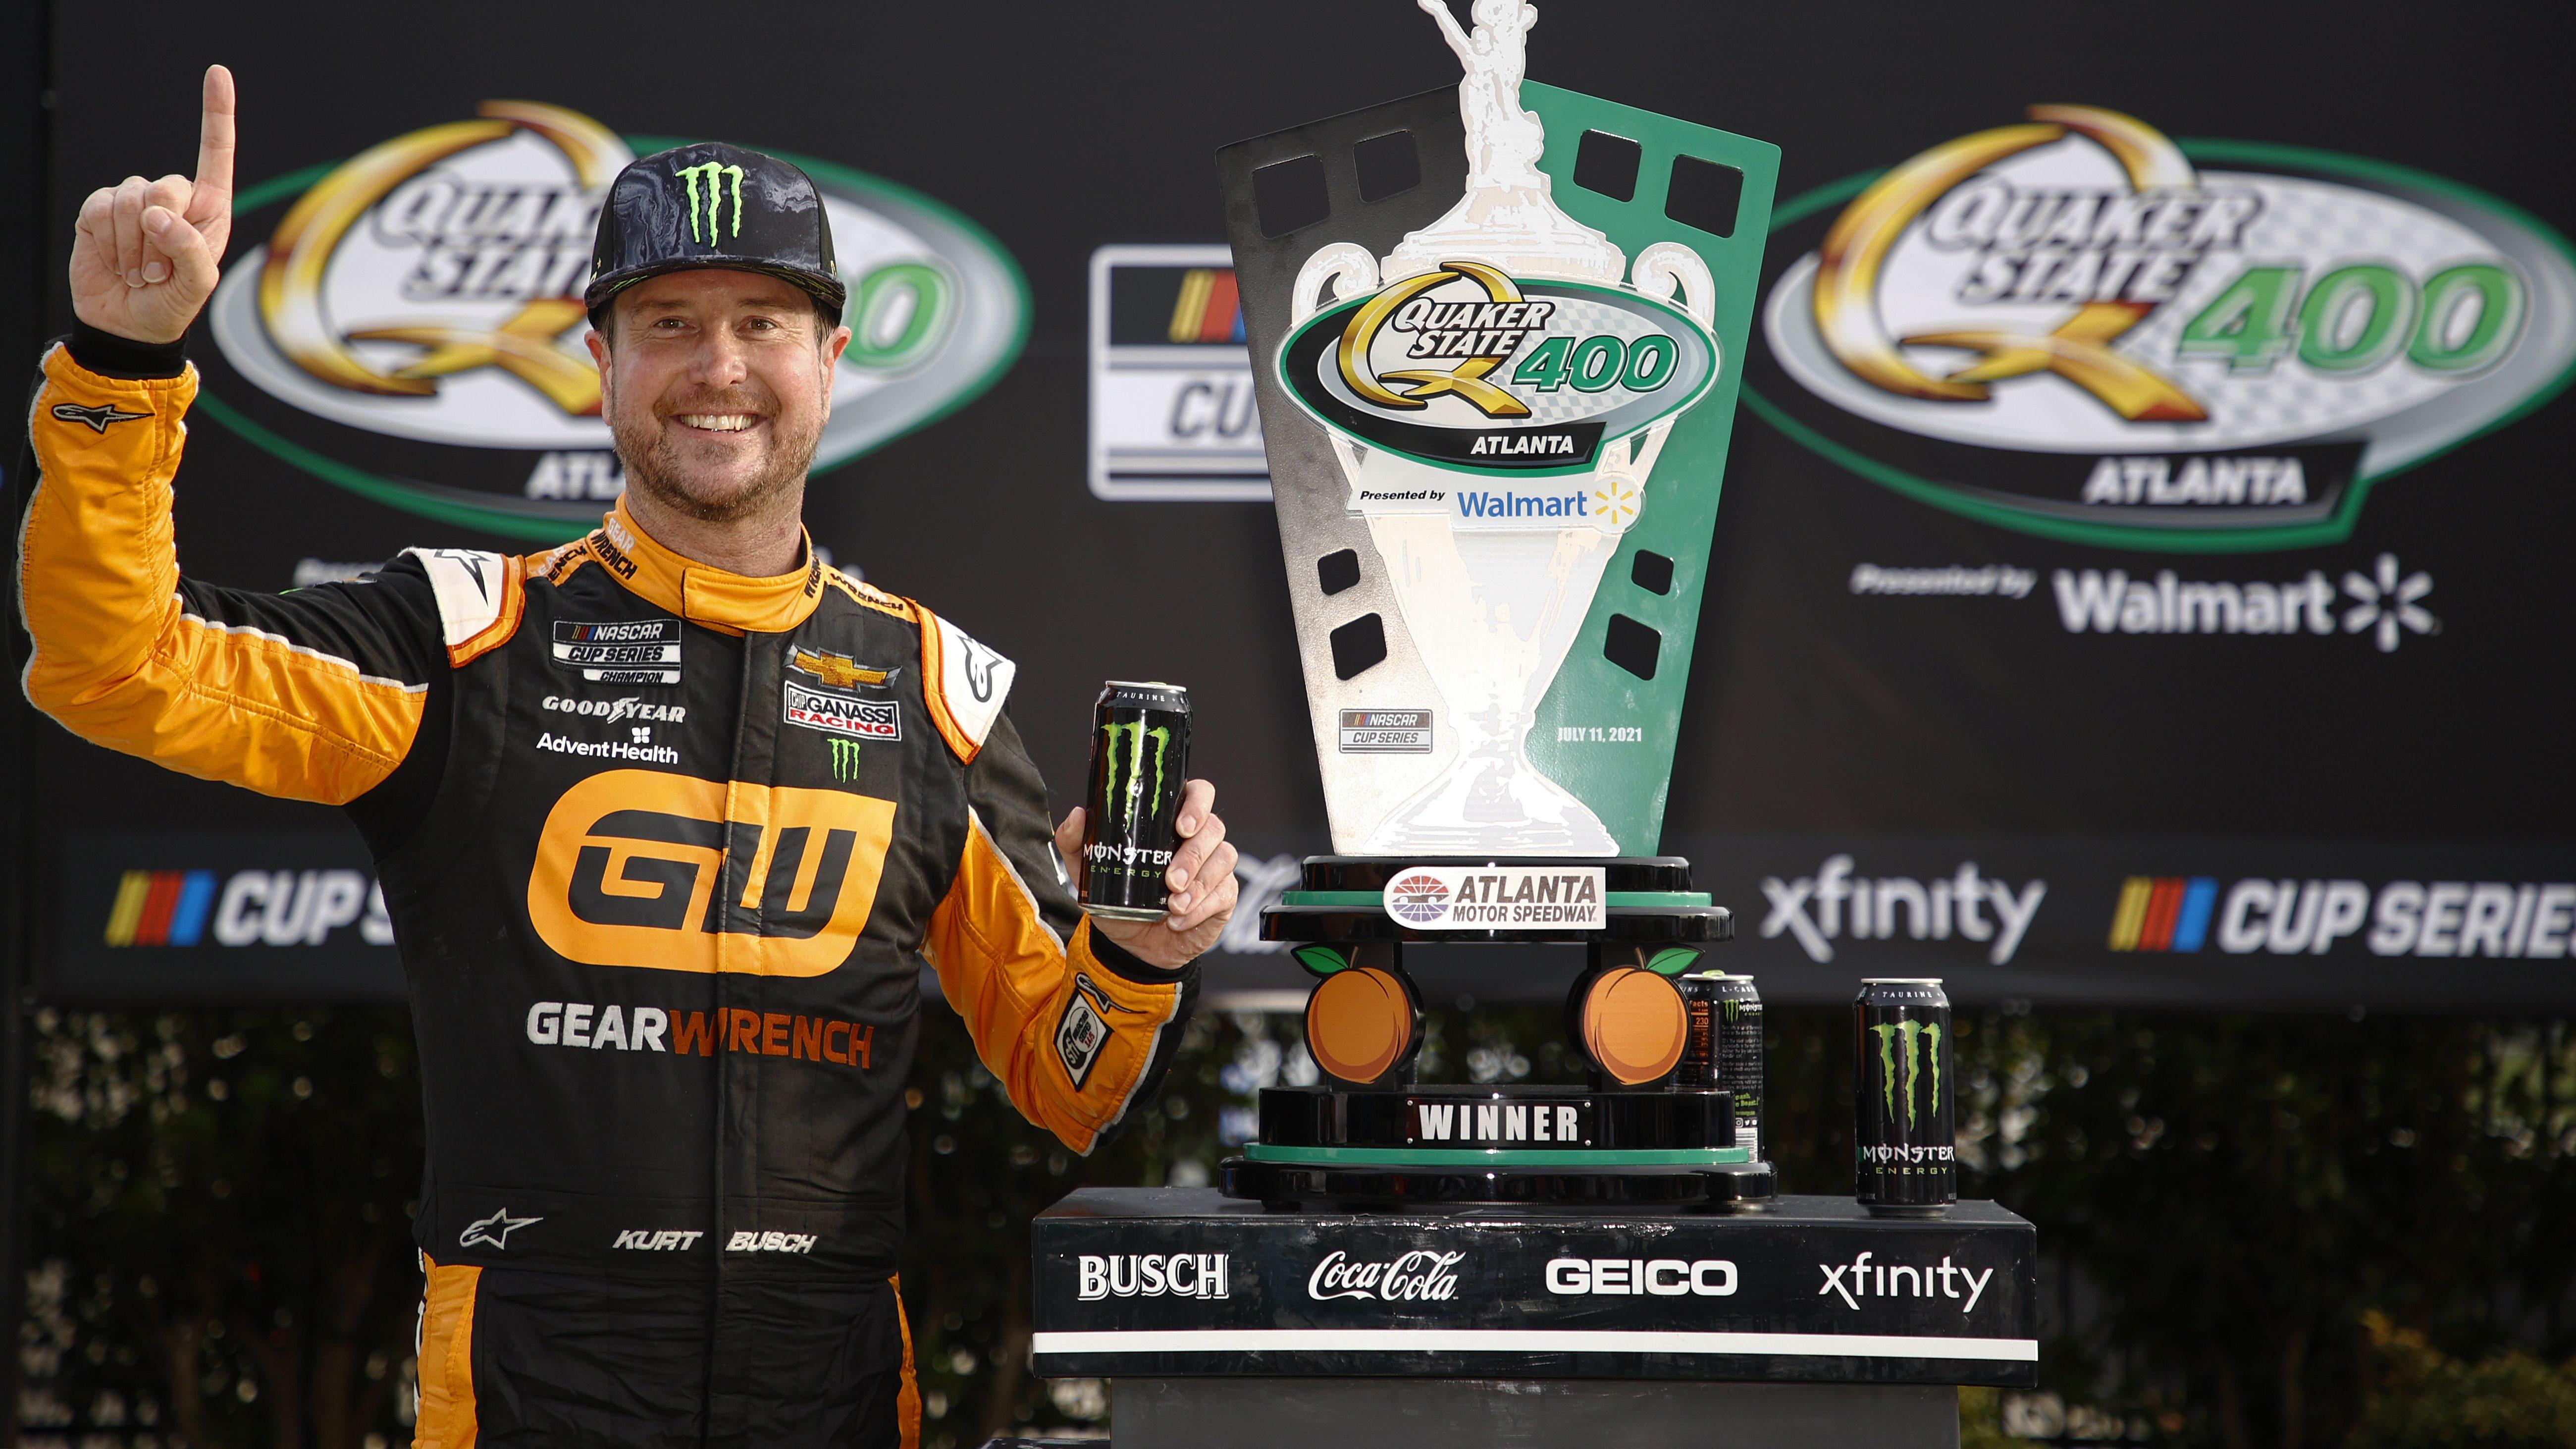 Kurt Busch Partners With NASCAR for 'Window of Hope' - Heavy.com